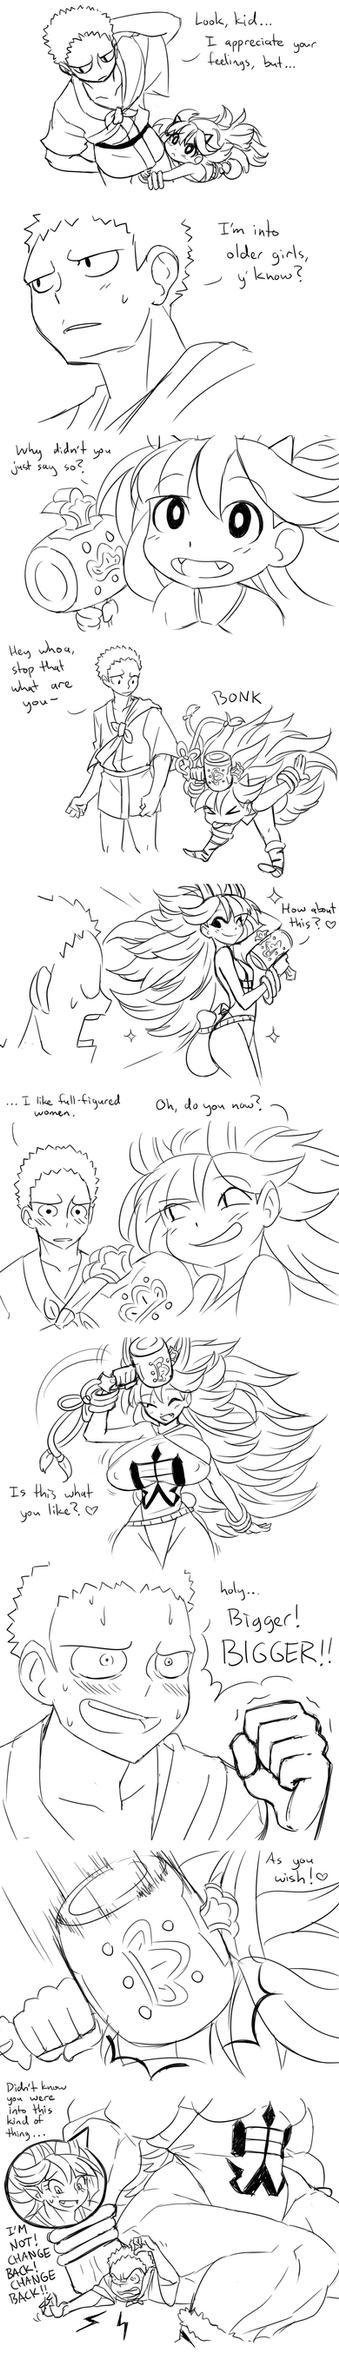 Oni-chan and Onii-chan by Matsu-sensei